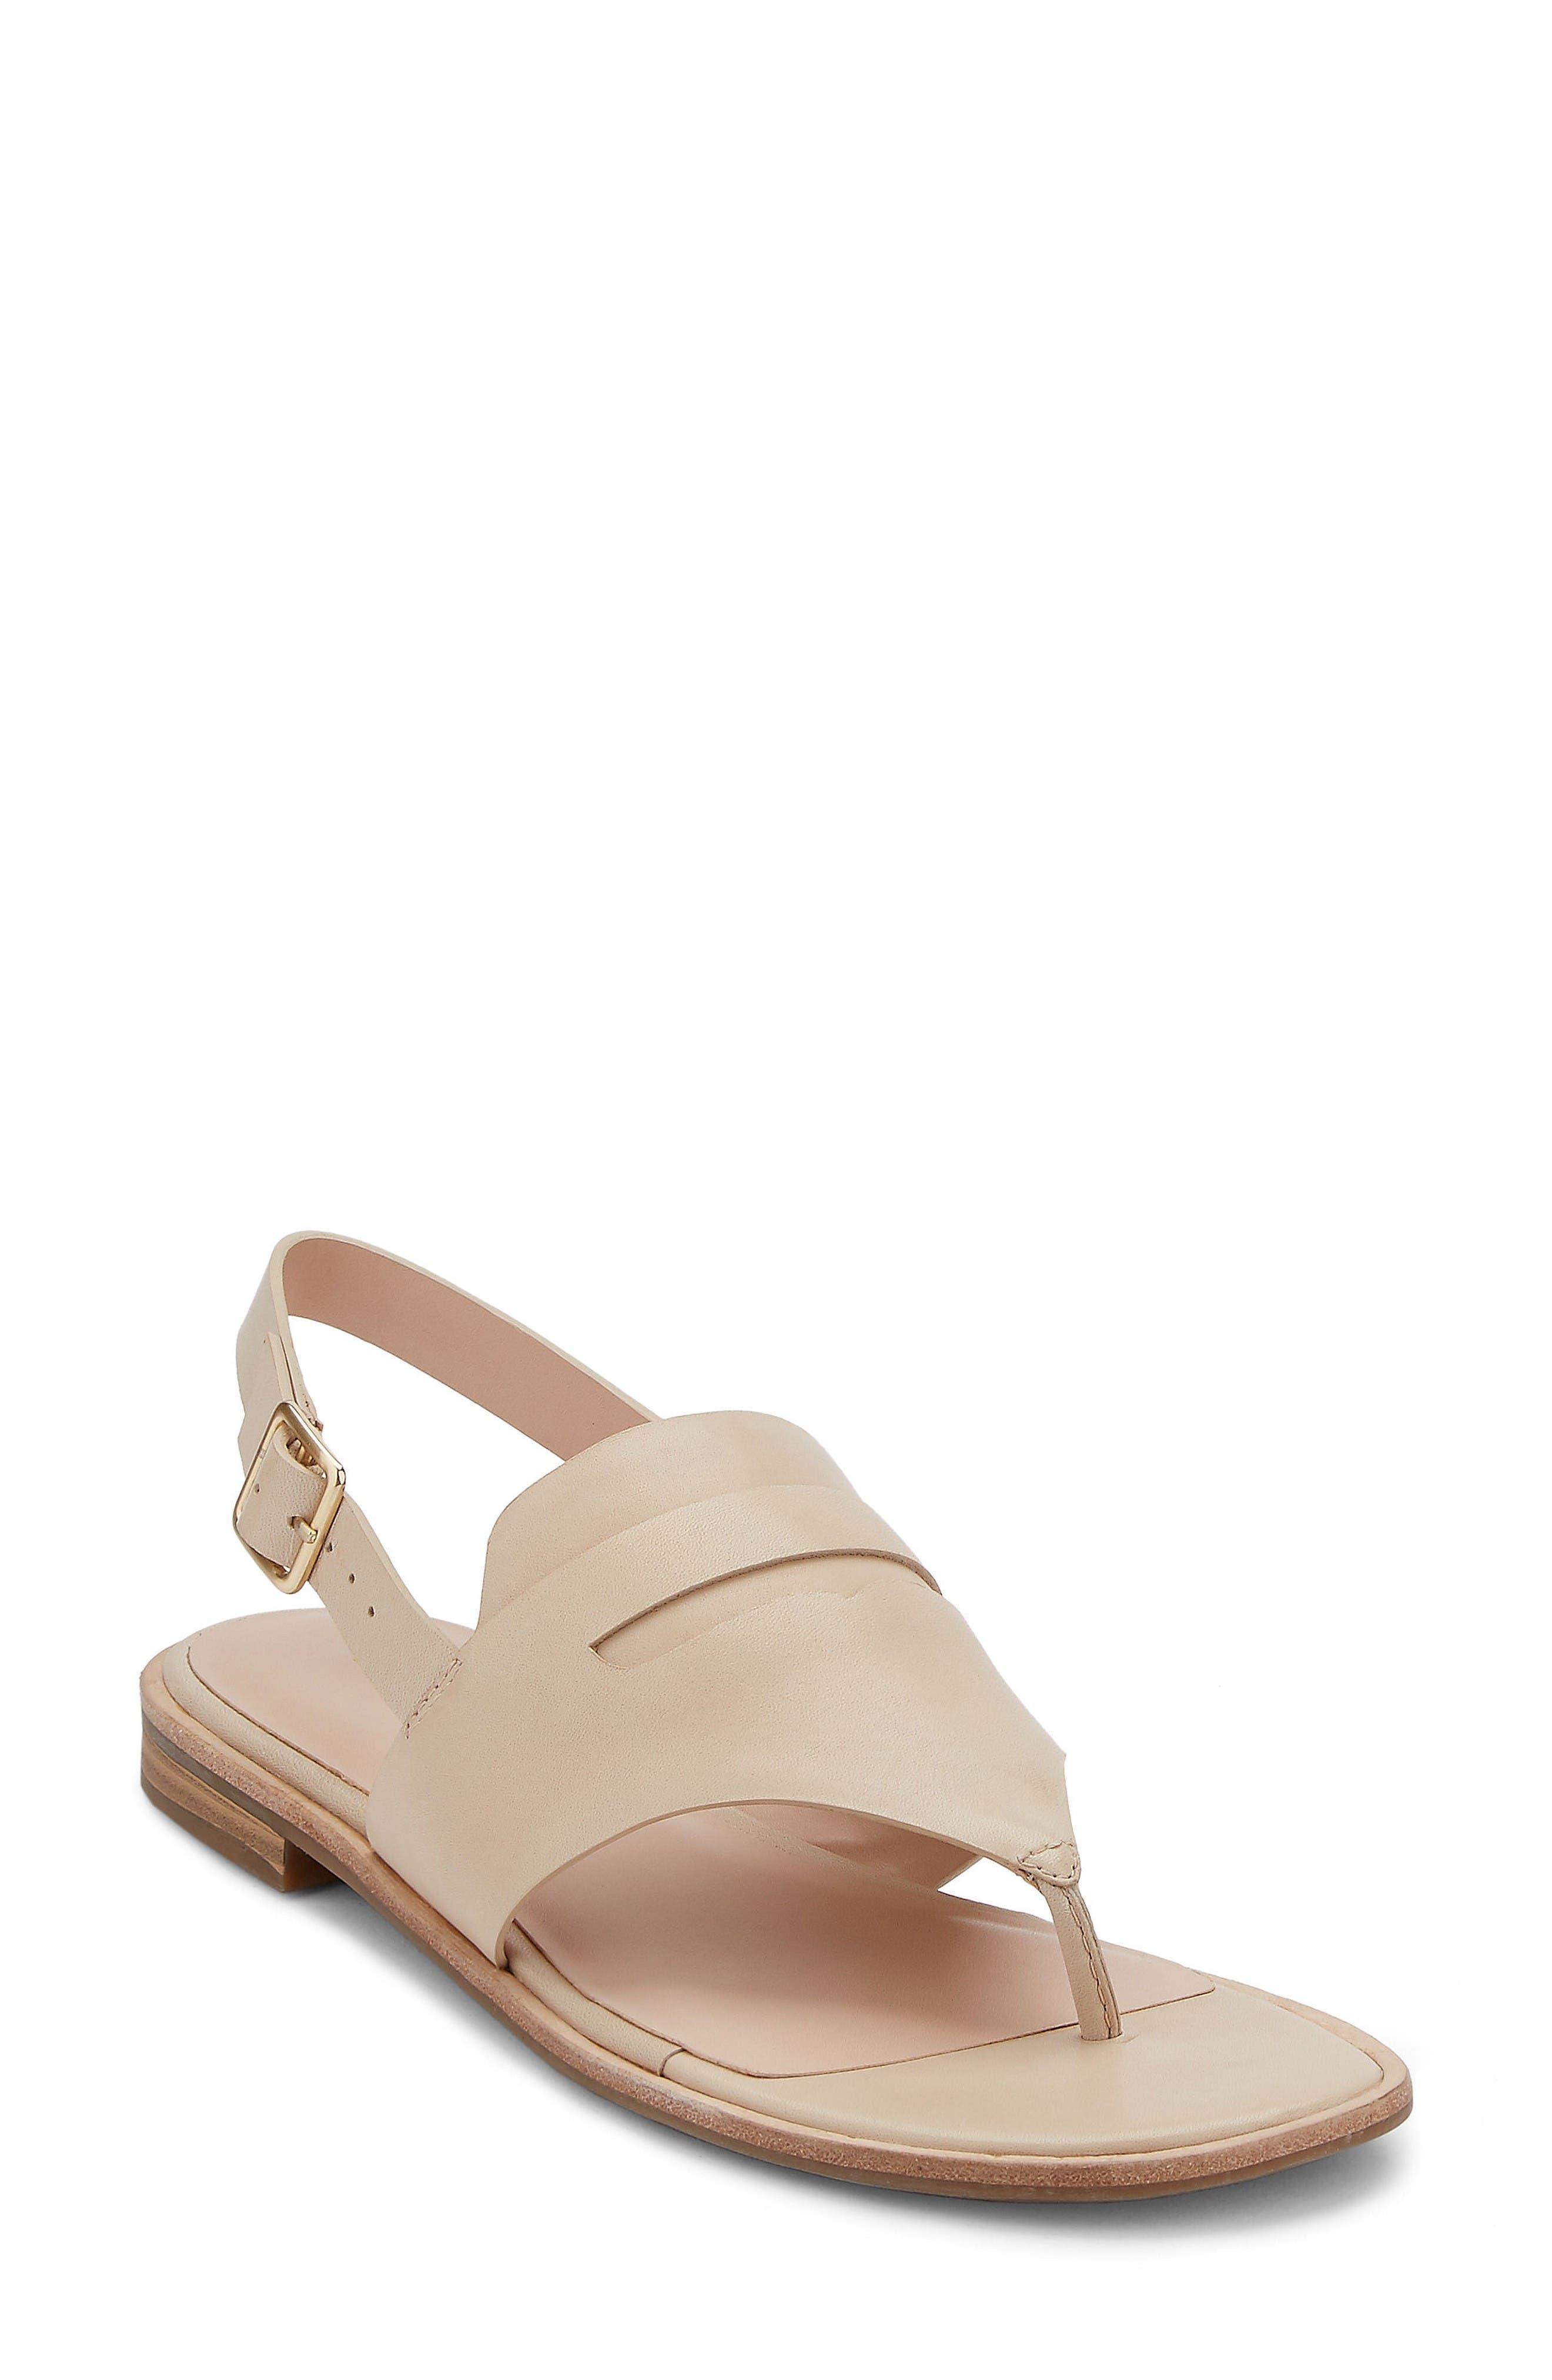 Maddie Slingback Sandal,                         Main,                         color, Cream Leather